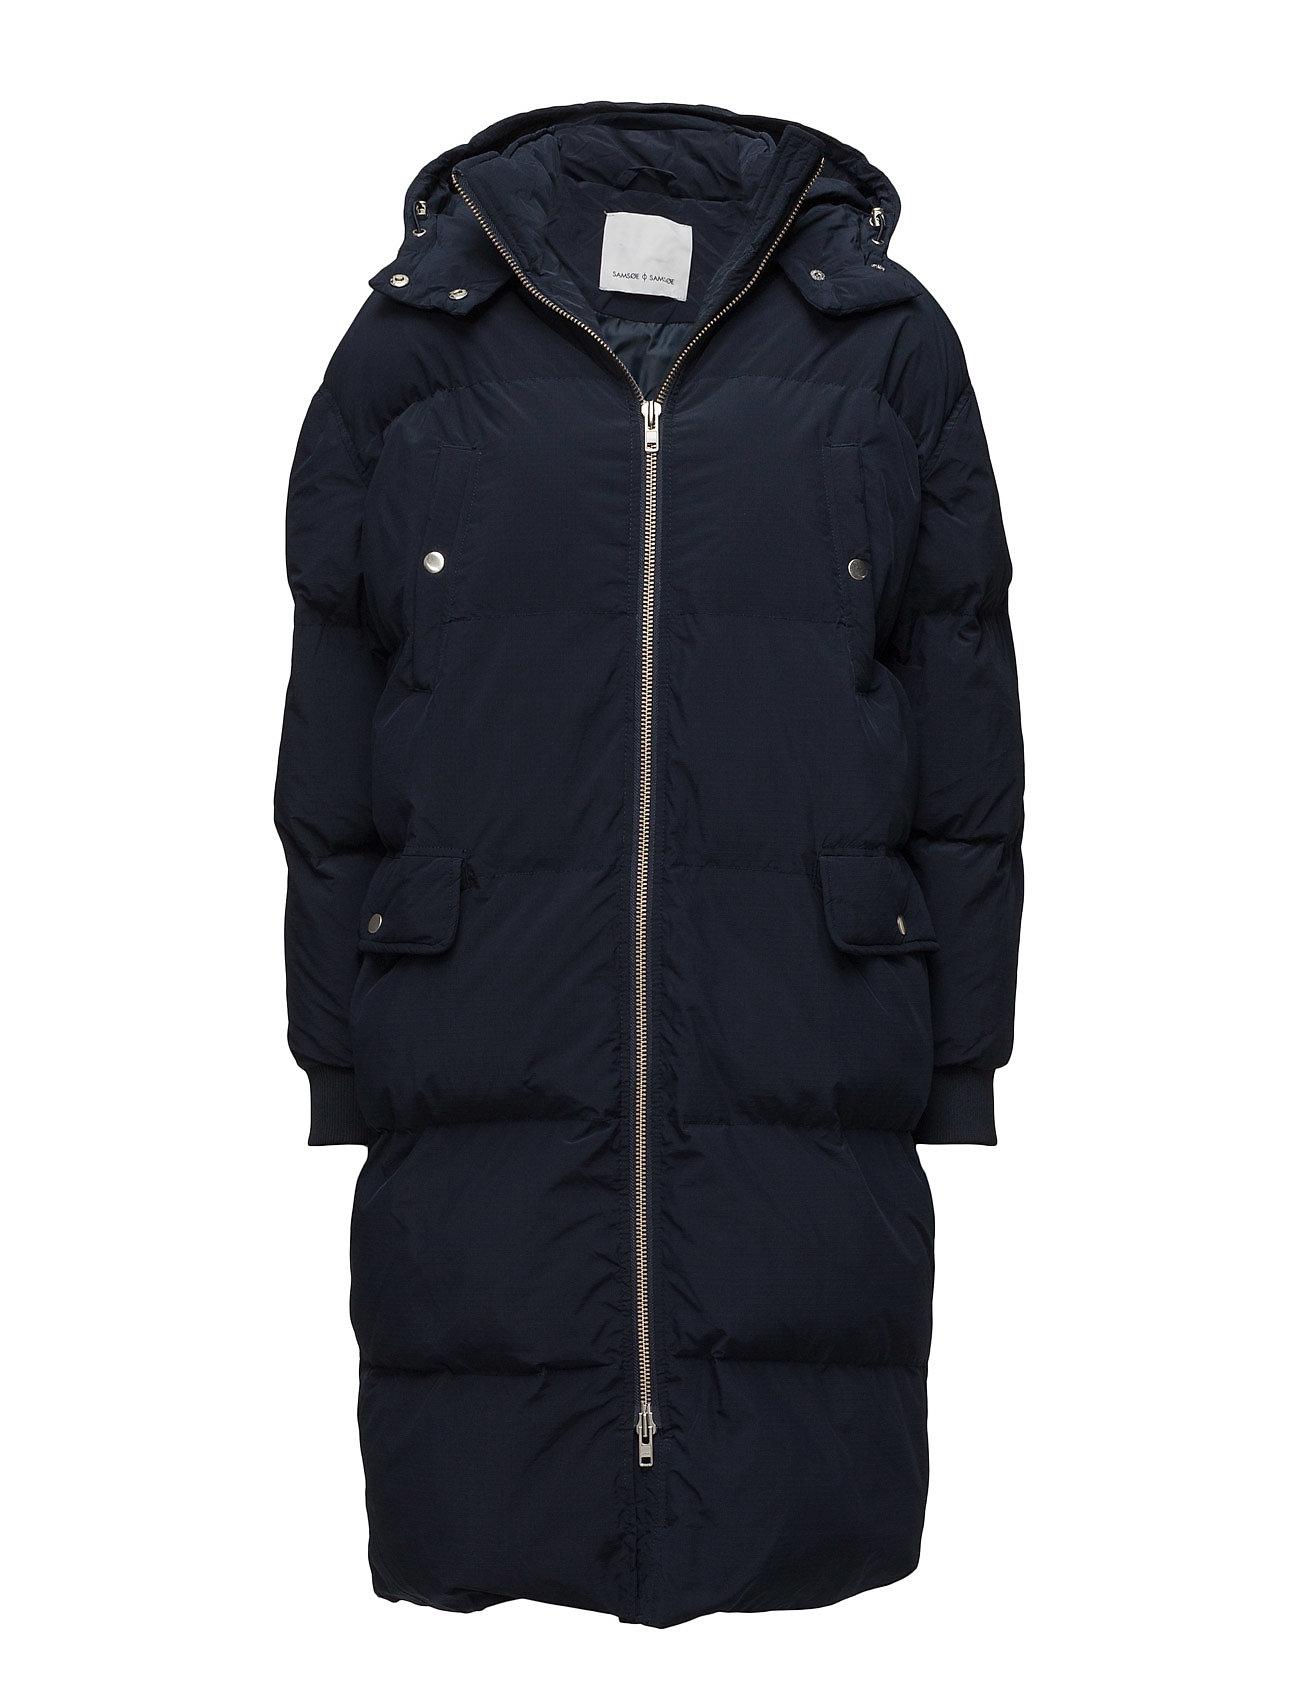 Samsøe & Samsøe Madge jacket 8276